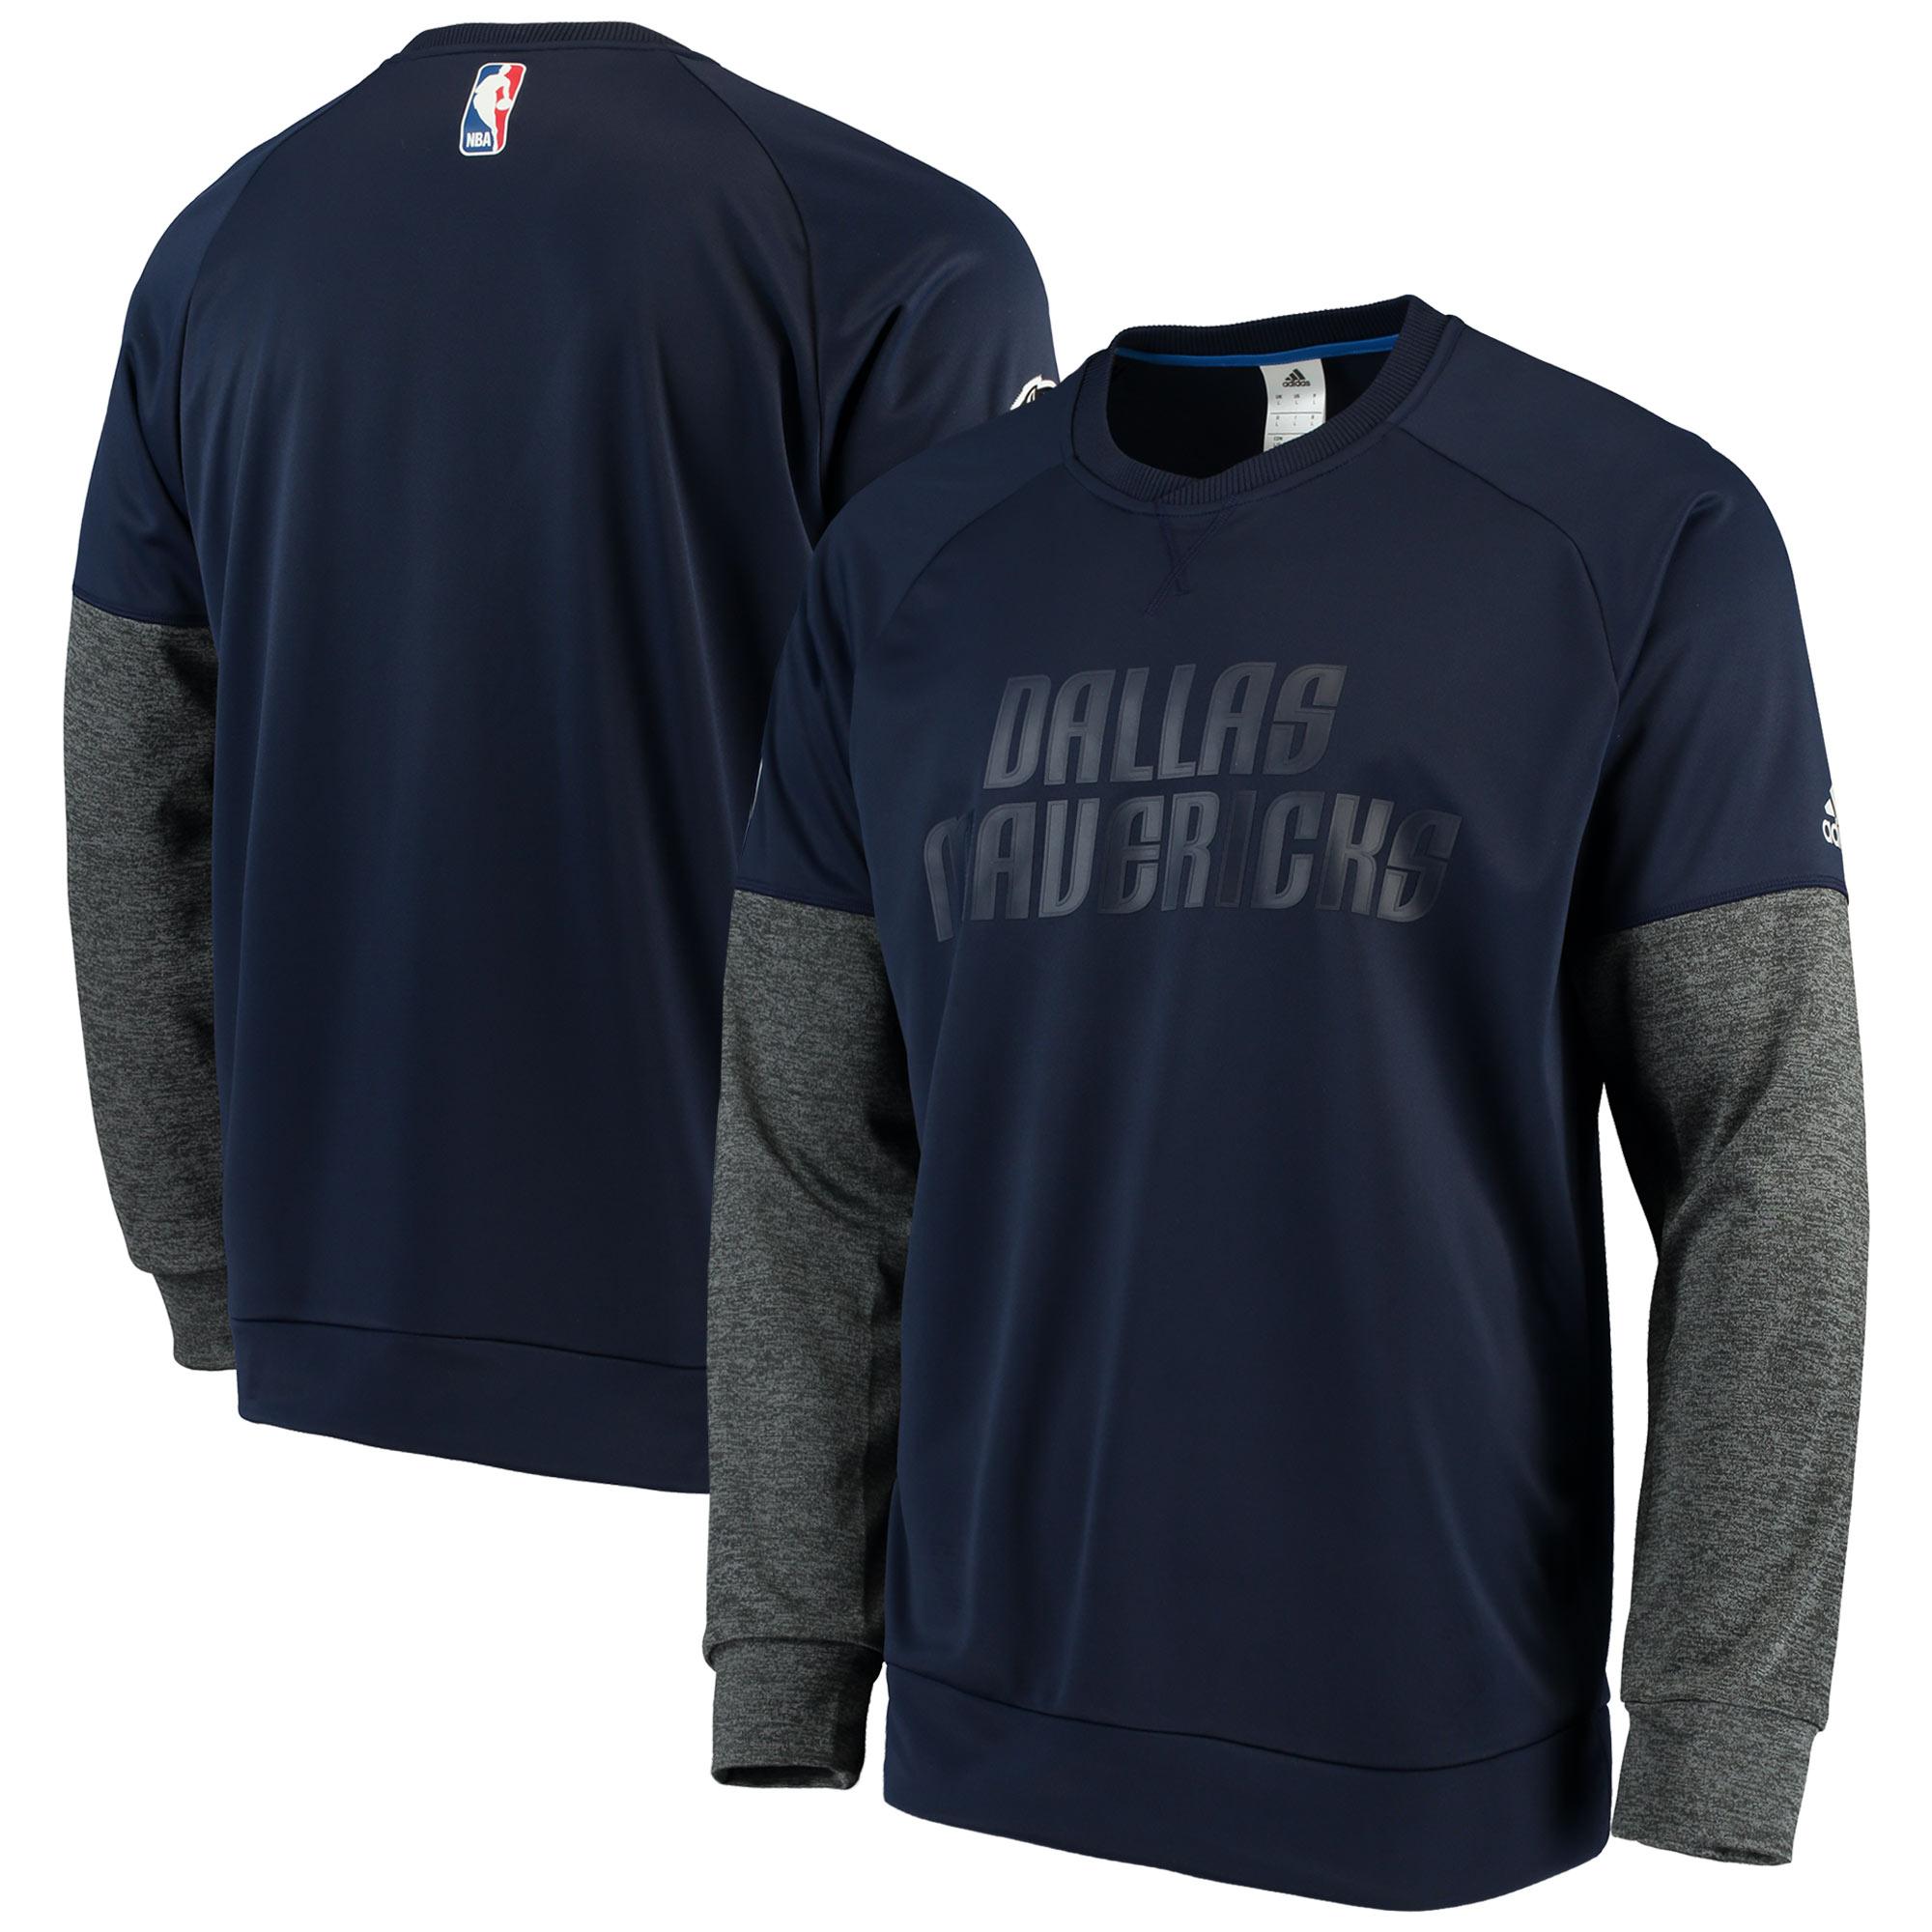 Dallas Mavericks adidas 2016 Christmas Day Second Half Pullover Sweatshirt - Navy